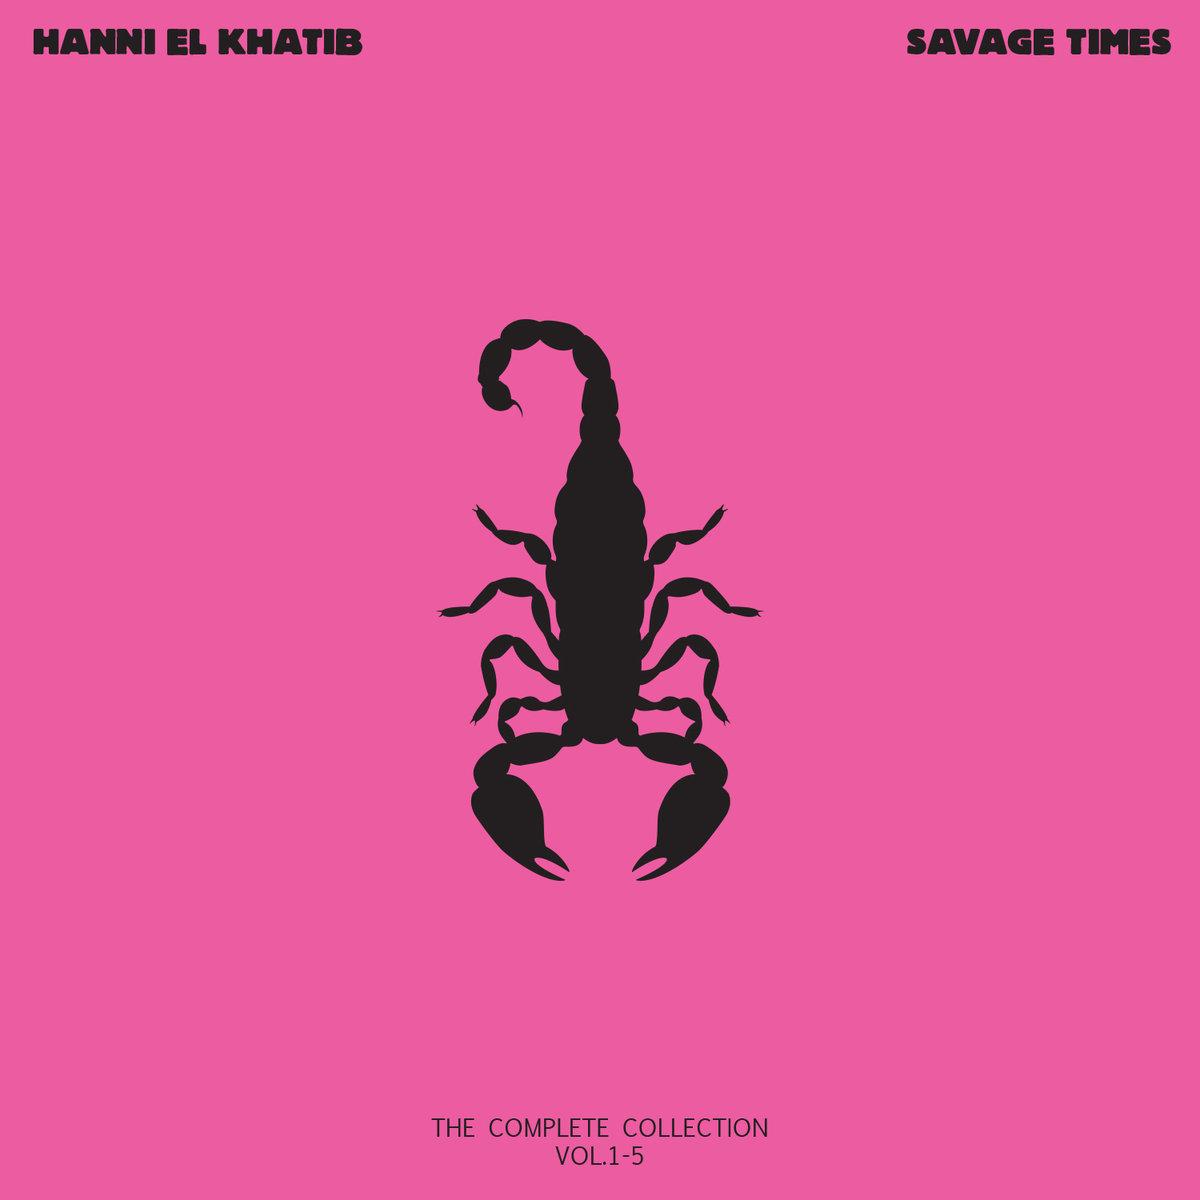 Hanni El Khatib - Savage Times